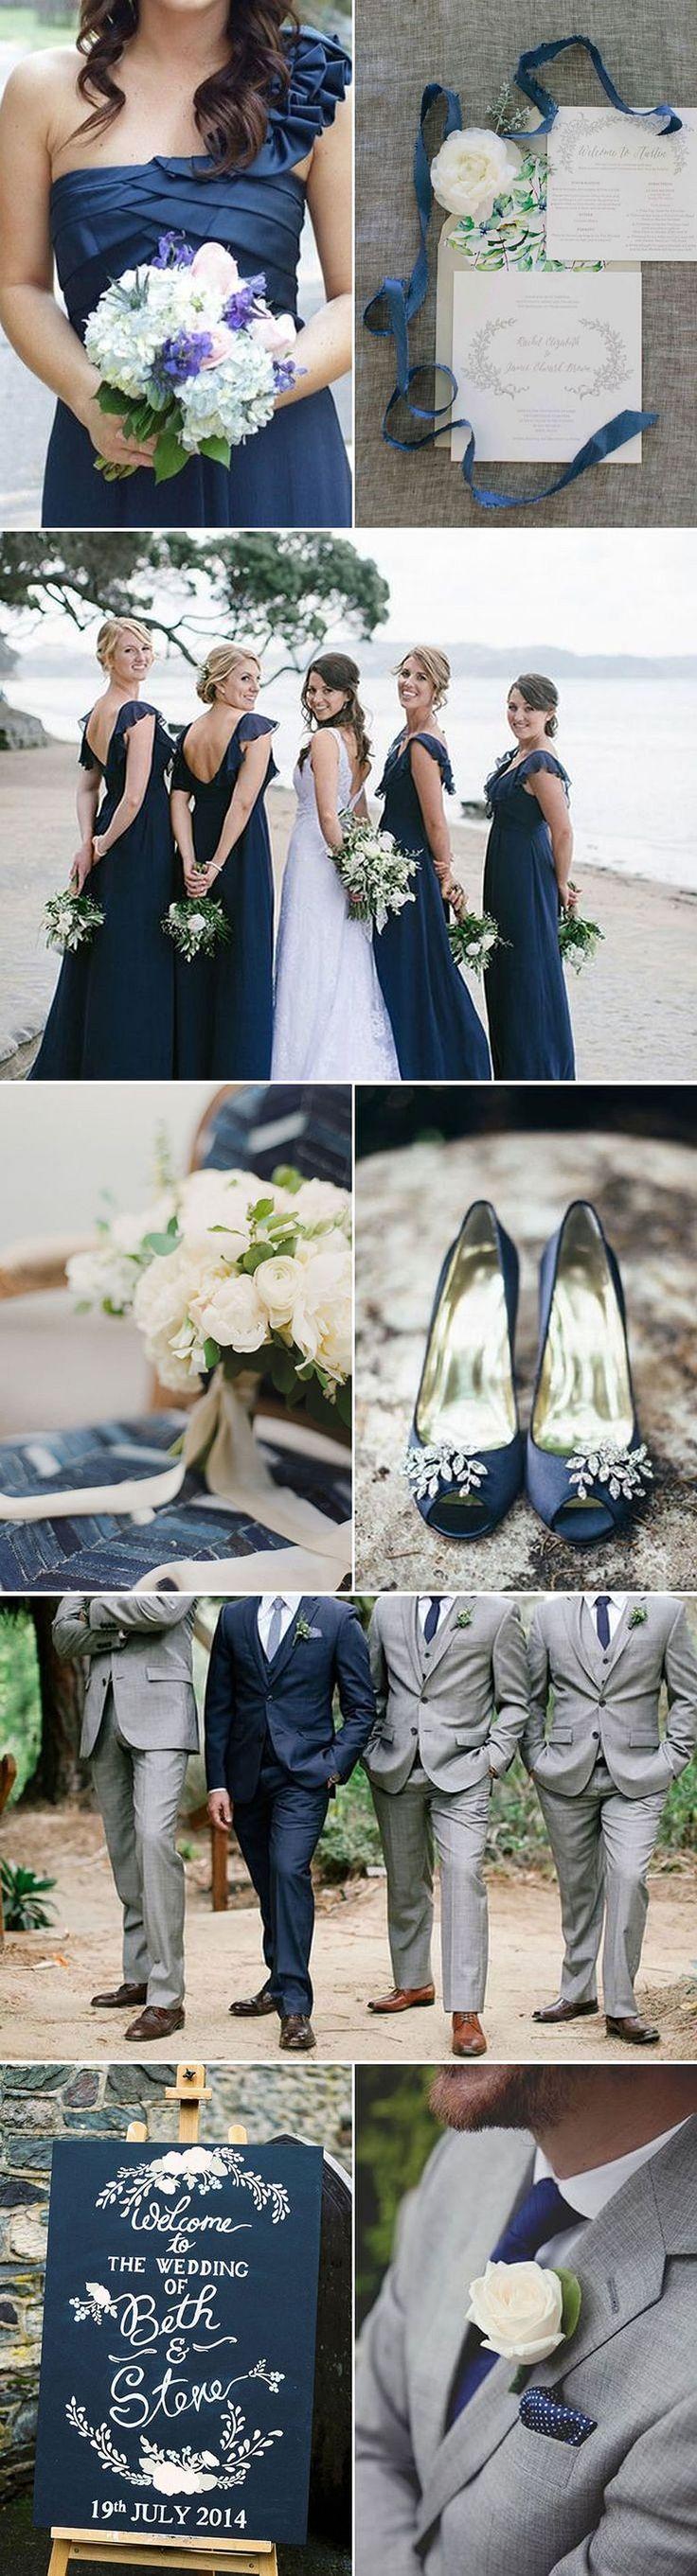 Stunning 108 Navy Blue Wedding Theme Ideas https://weddmagz.com/108-navy-blue-wedding-theme-ideas/